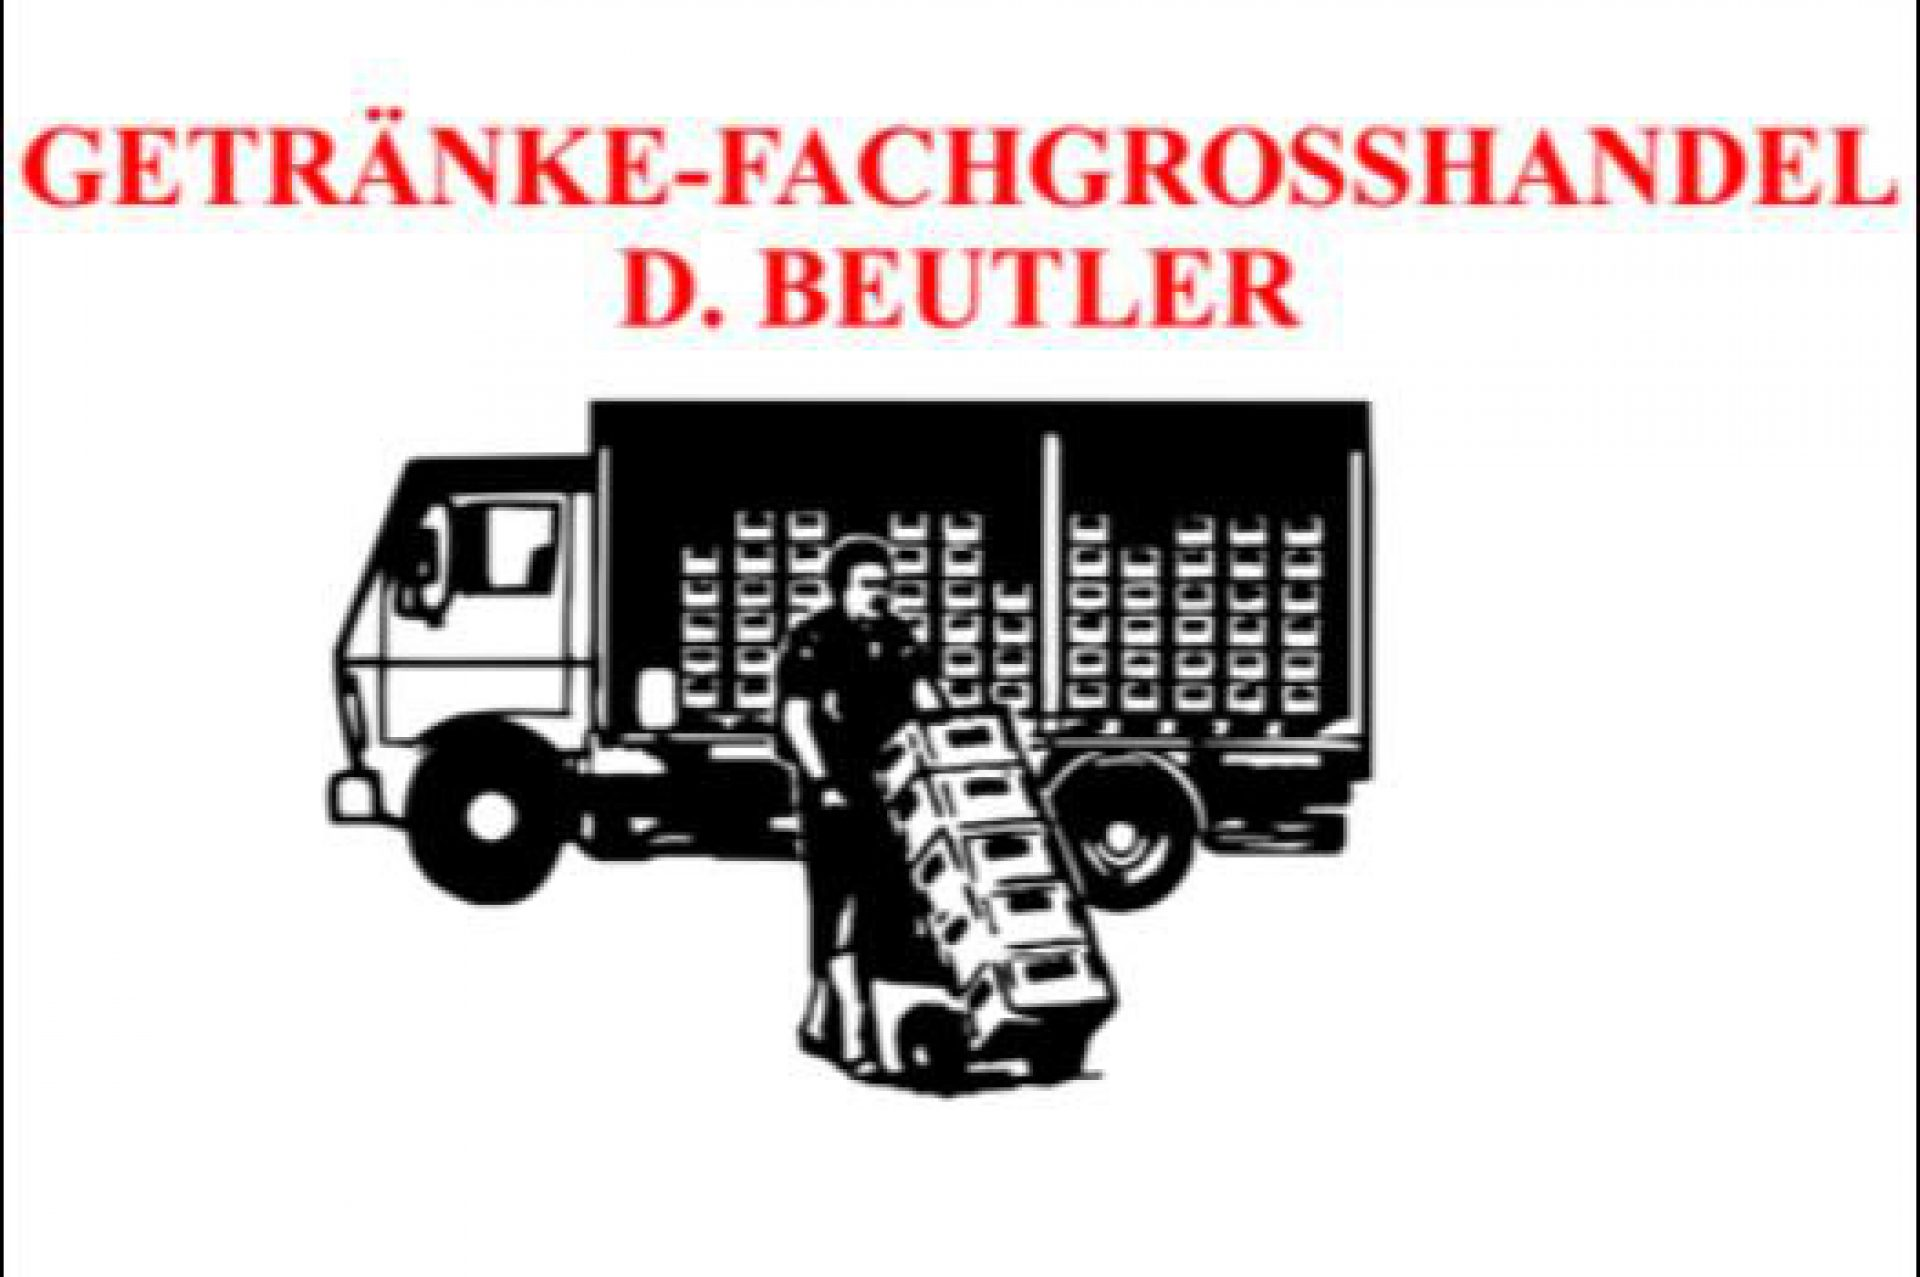 GETRÄNKE_FACHGROSSHANDEL